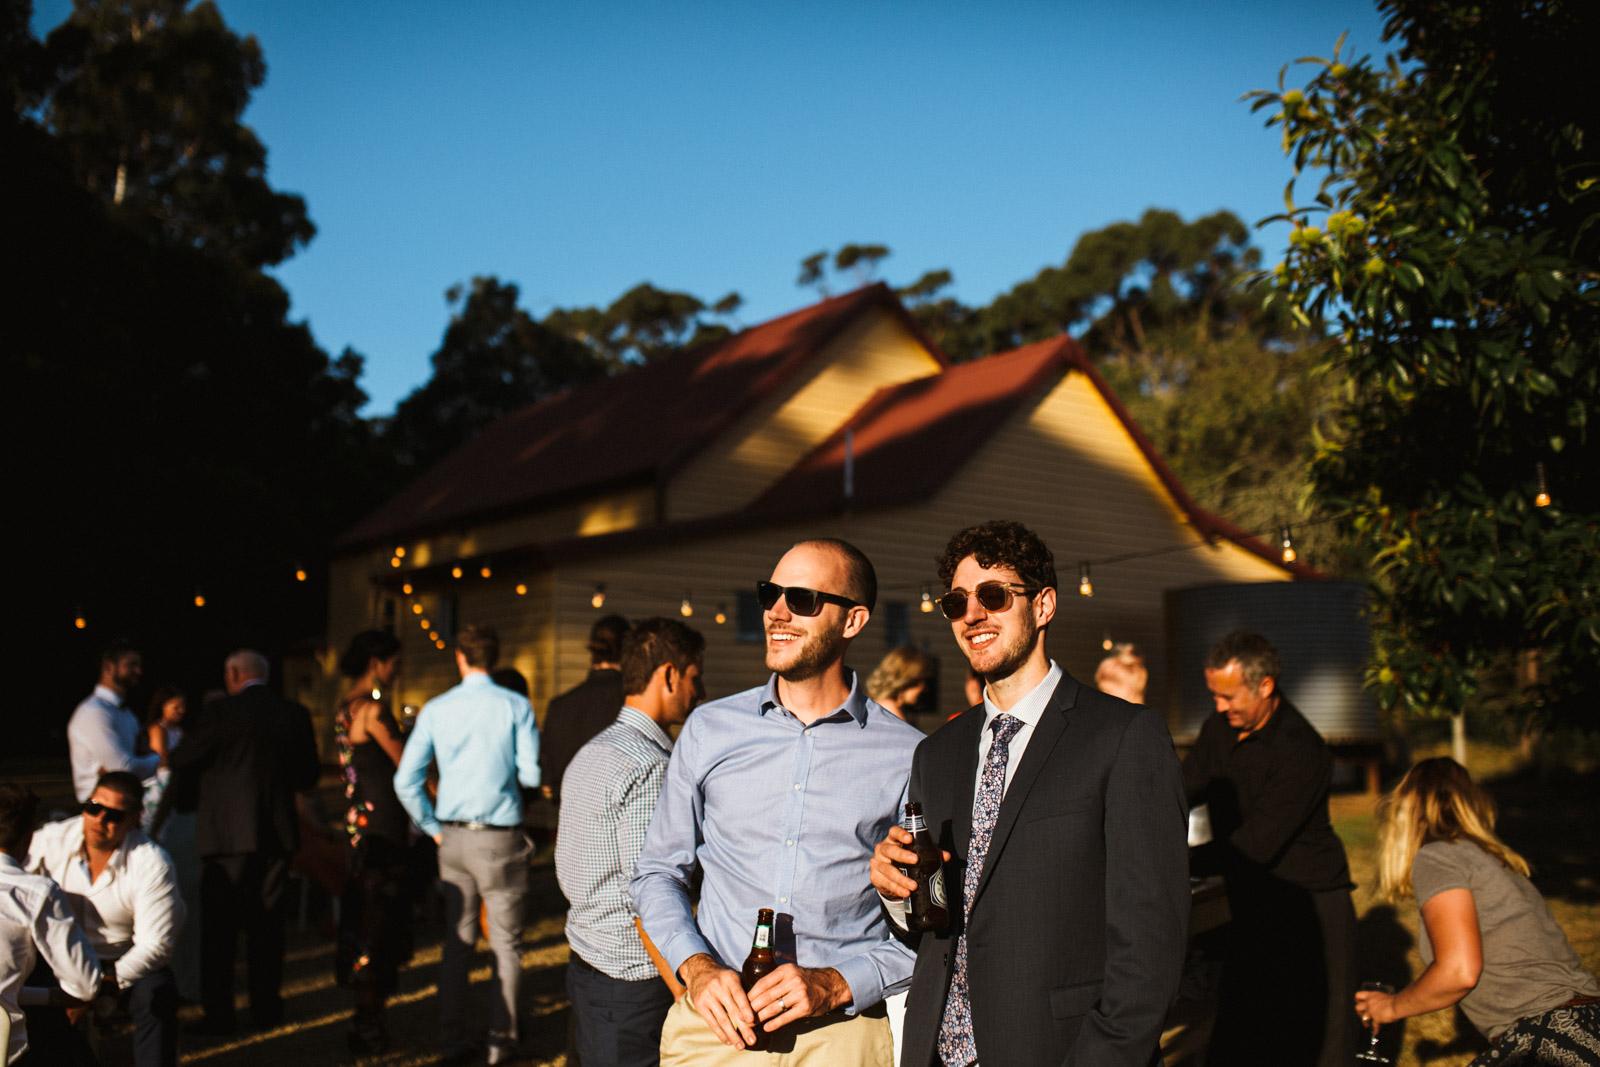 ZD-Melbourne Wedding Photographer-Dean Raphael-107.jpg